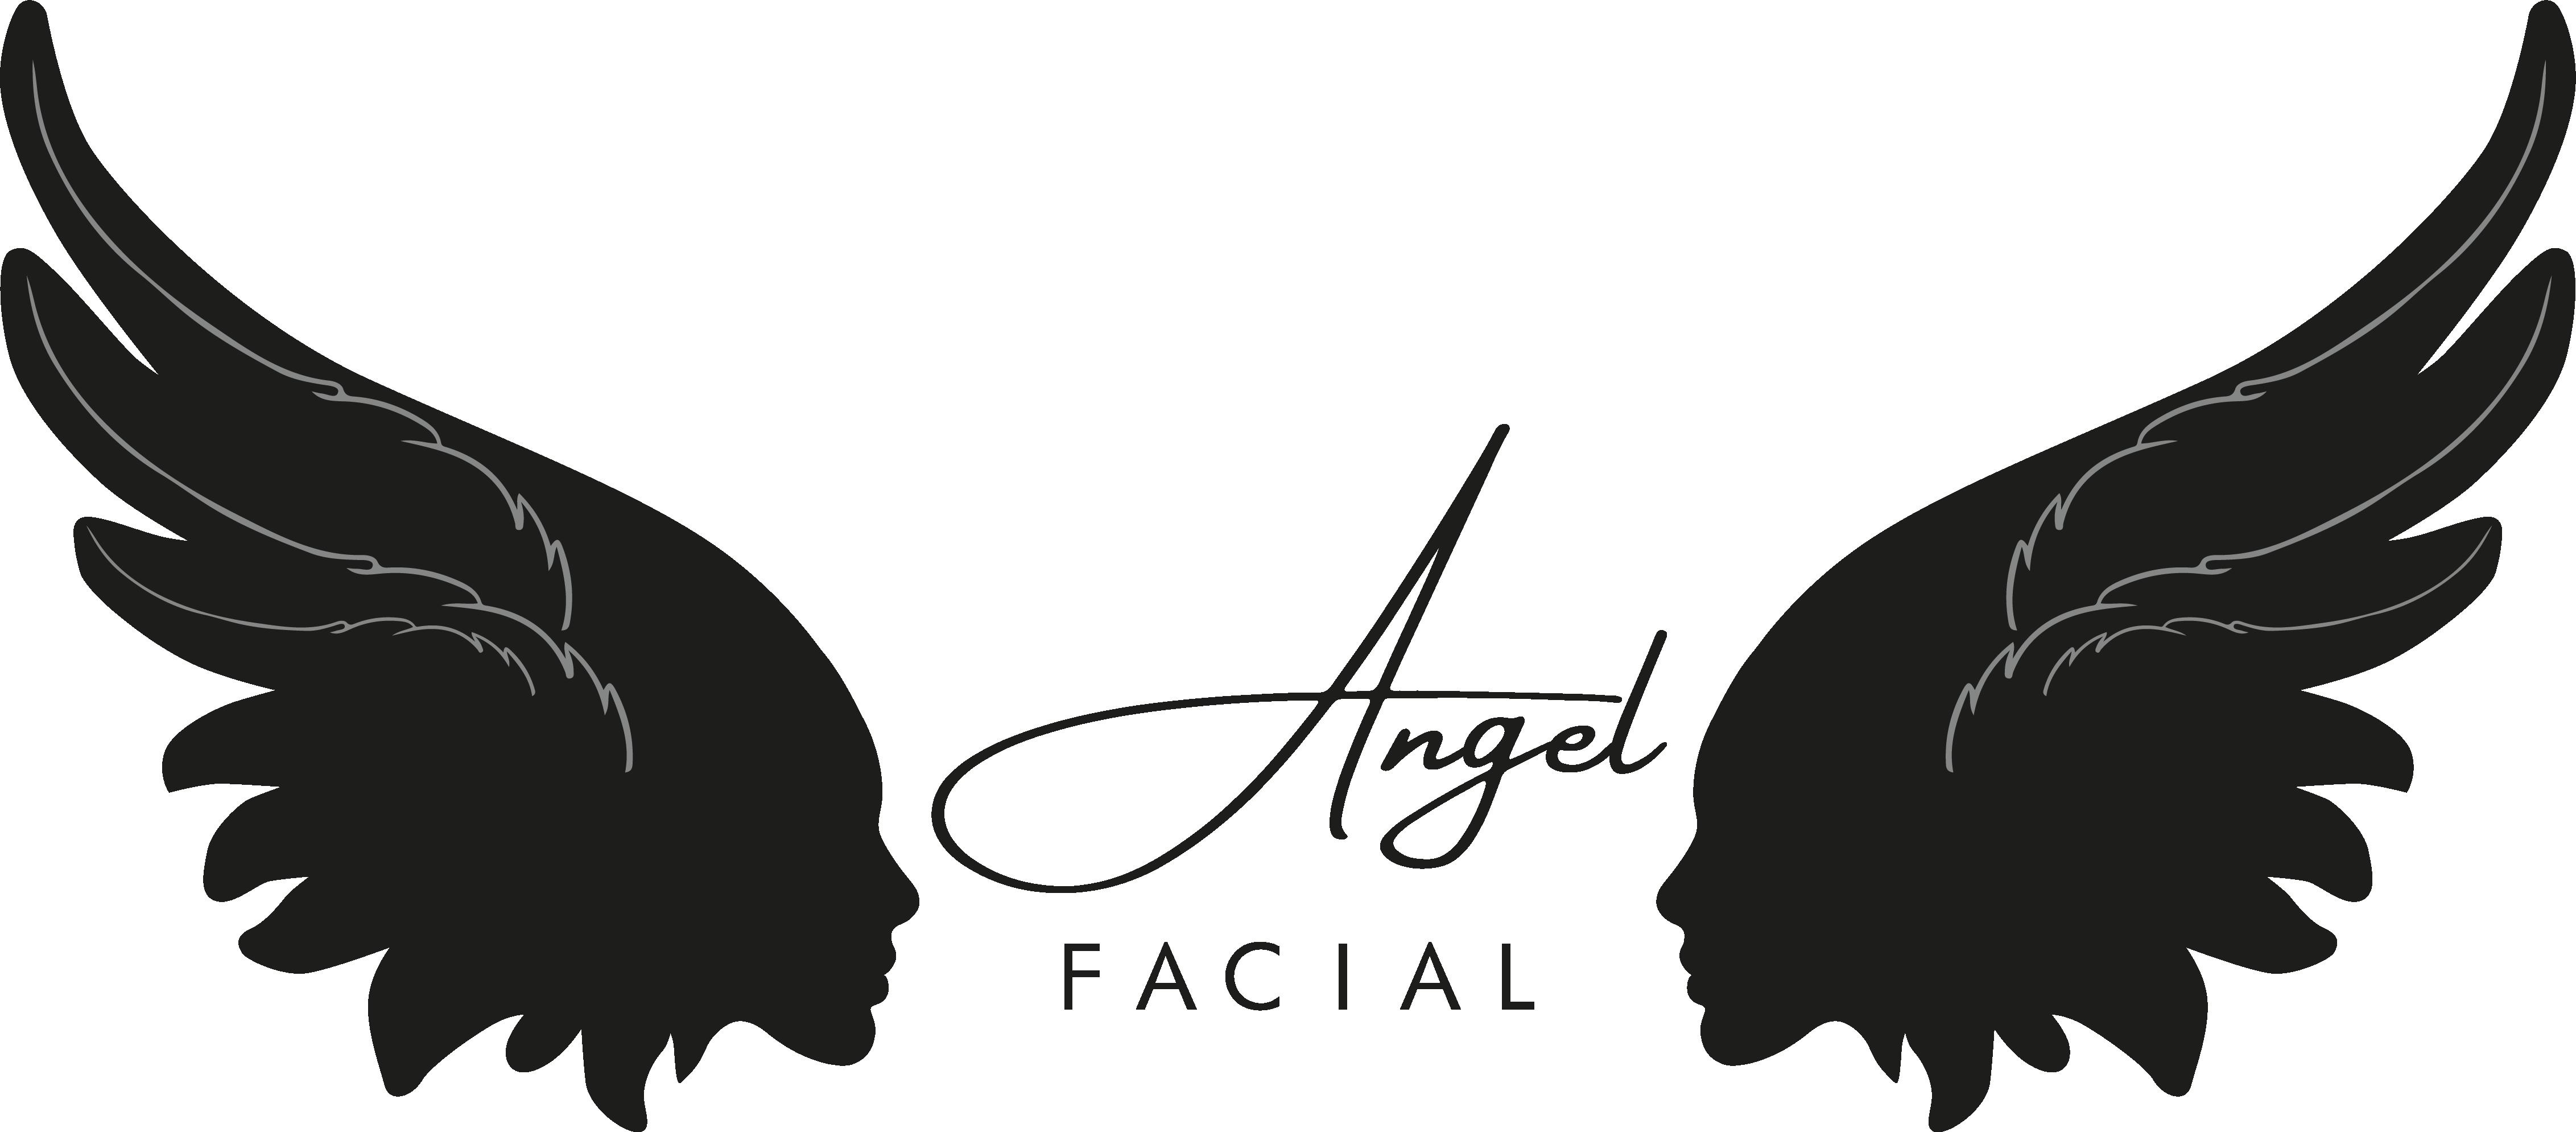 Angel Facial logo